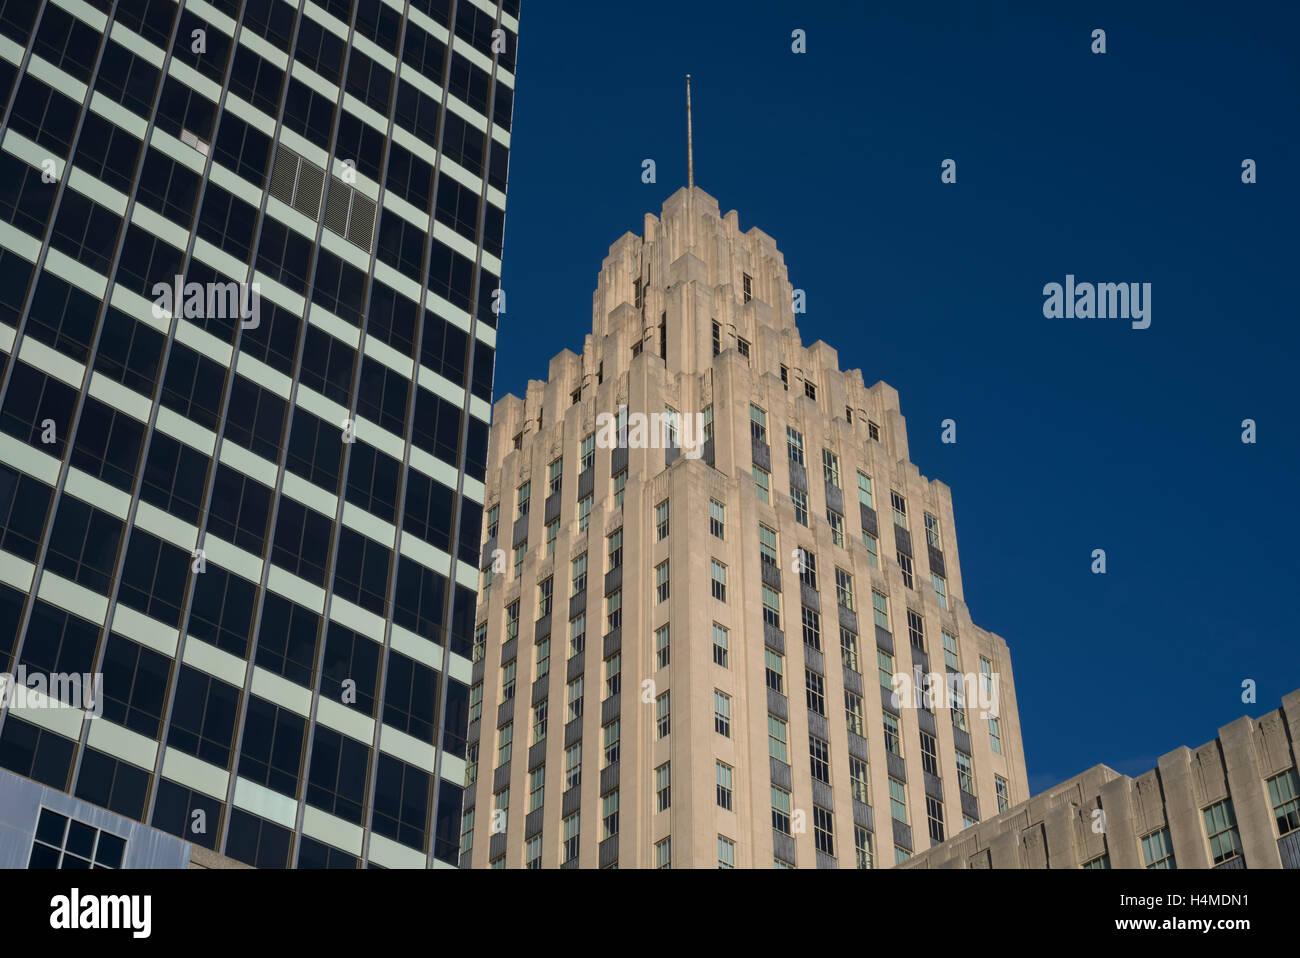 City Of Winston Salem >> Winston Tower 1966 And Rj Reynolds Building 1929 City Of